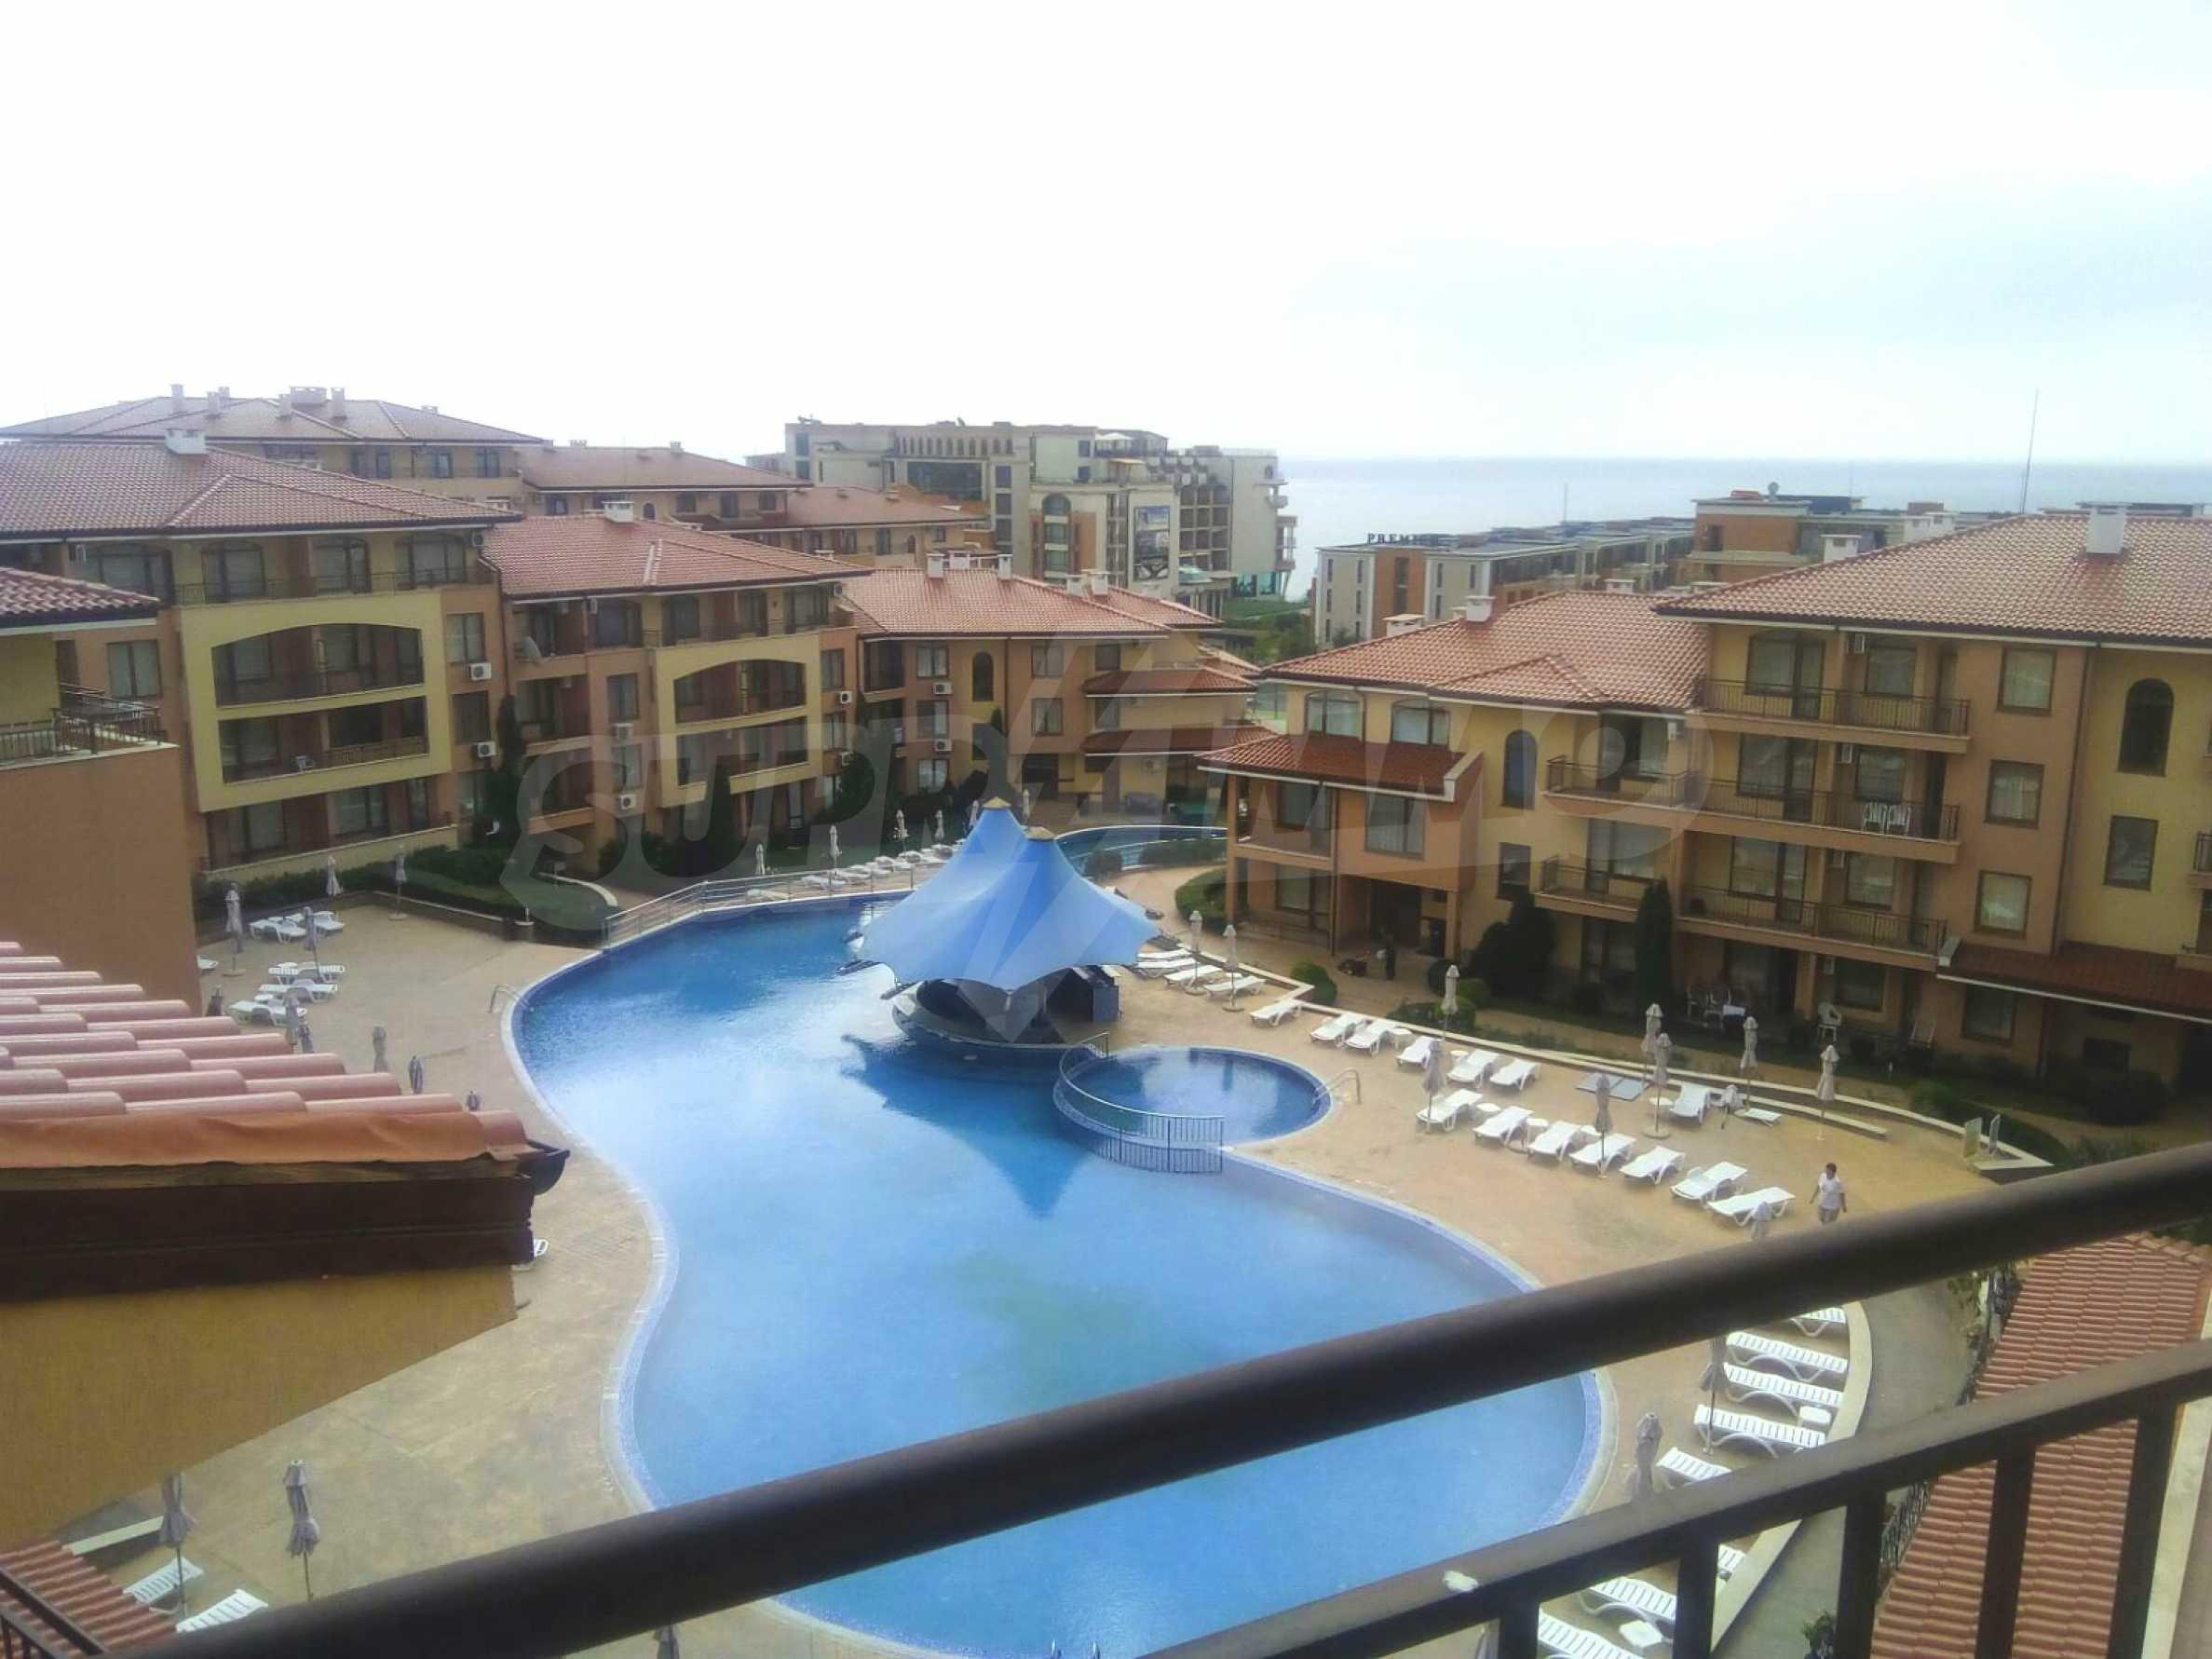 Стилен четиристаен апартамент само на сто метра от плажа, Свети Влас